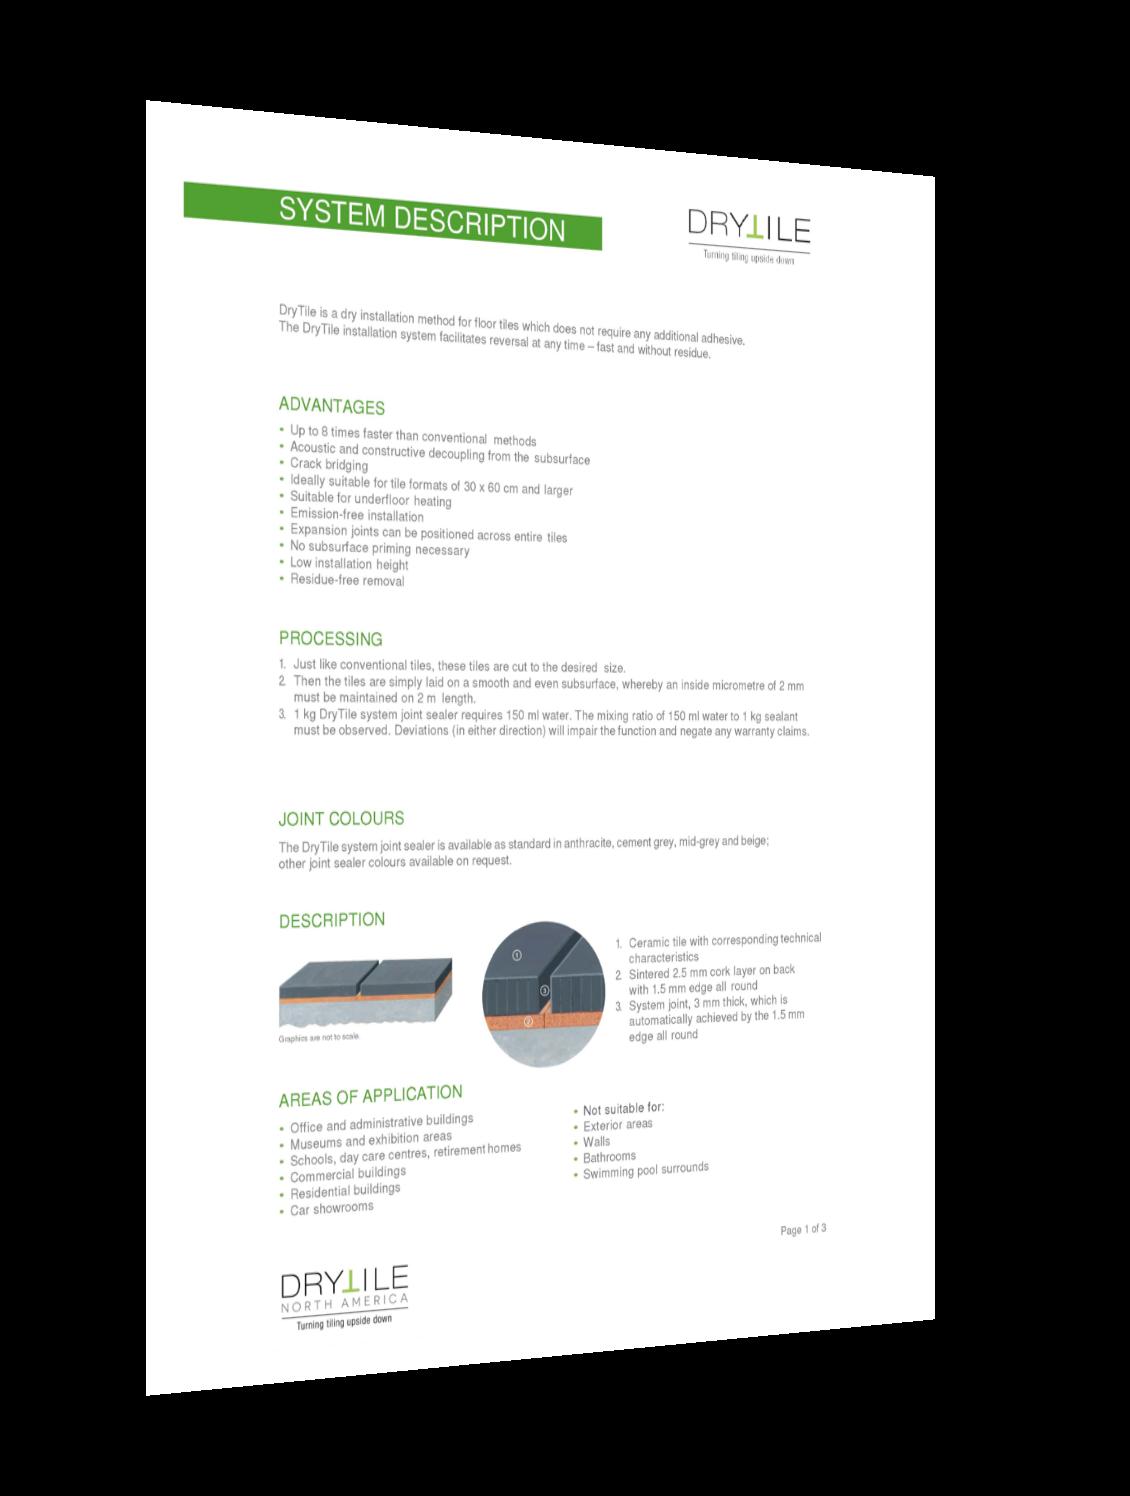 drytile system description. Data about dry tiling.